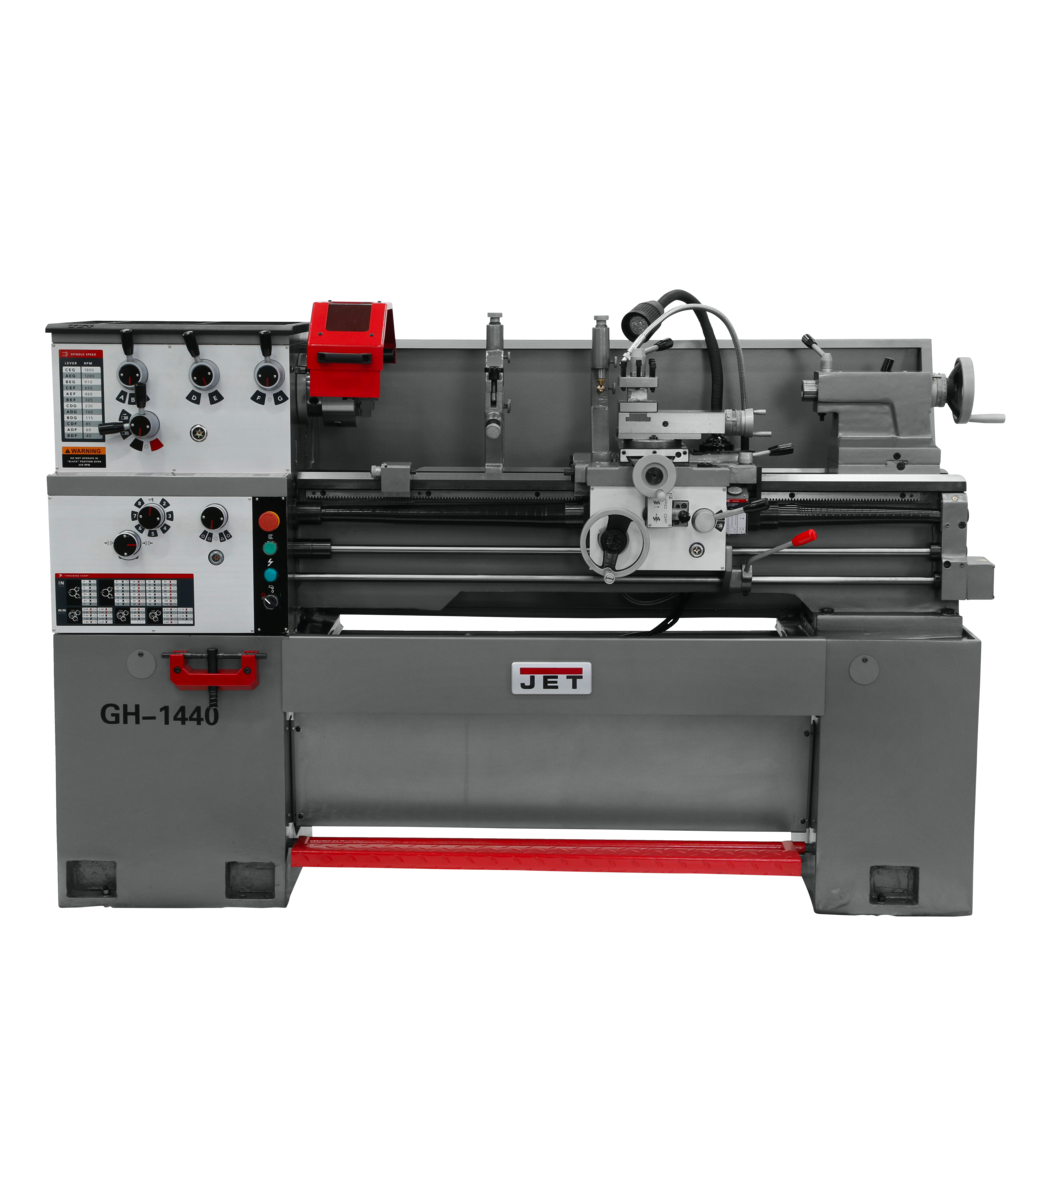 GH-1440-3  Lathe with Taper Attachment